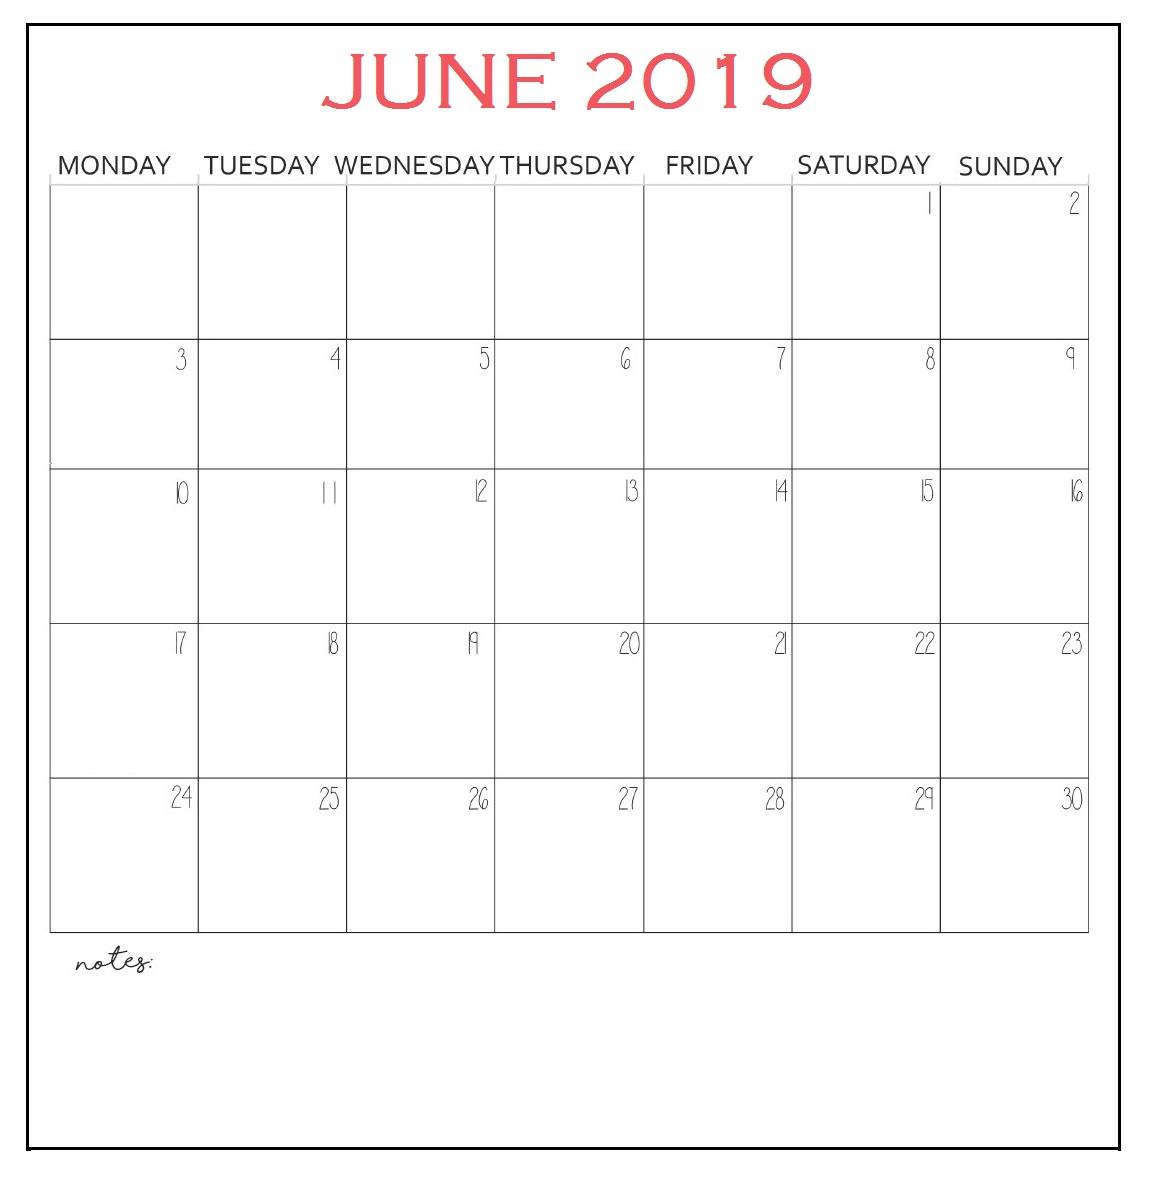 June 2019 Calendar Template PDF